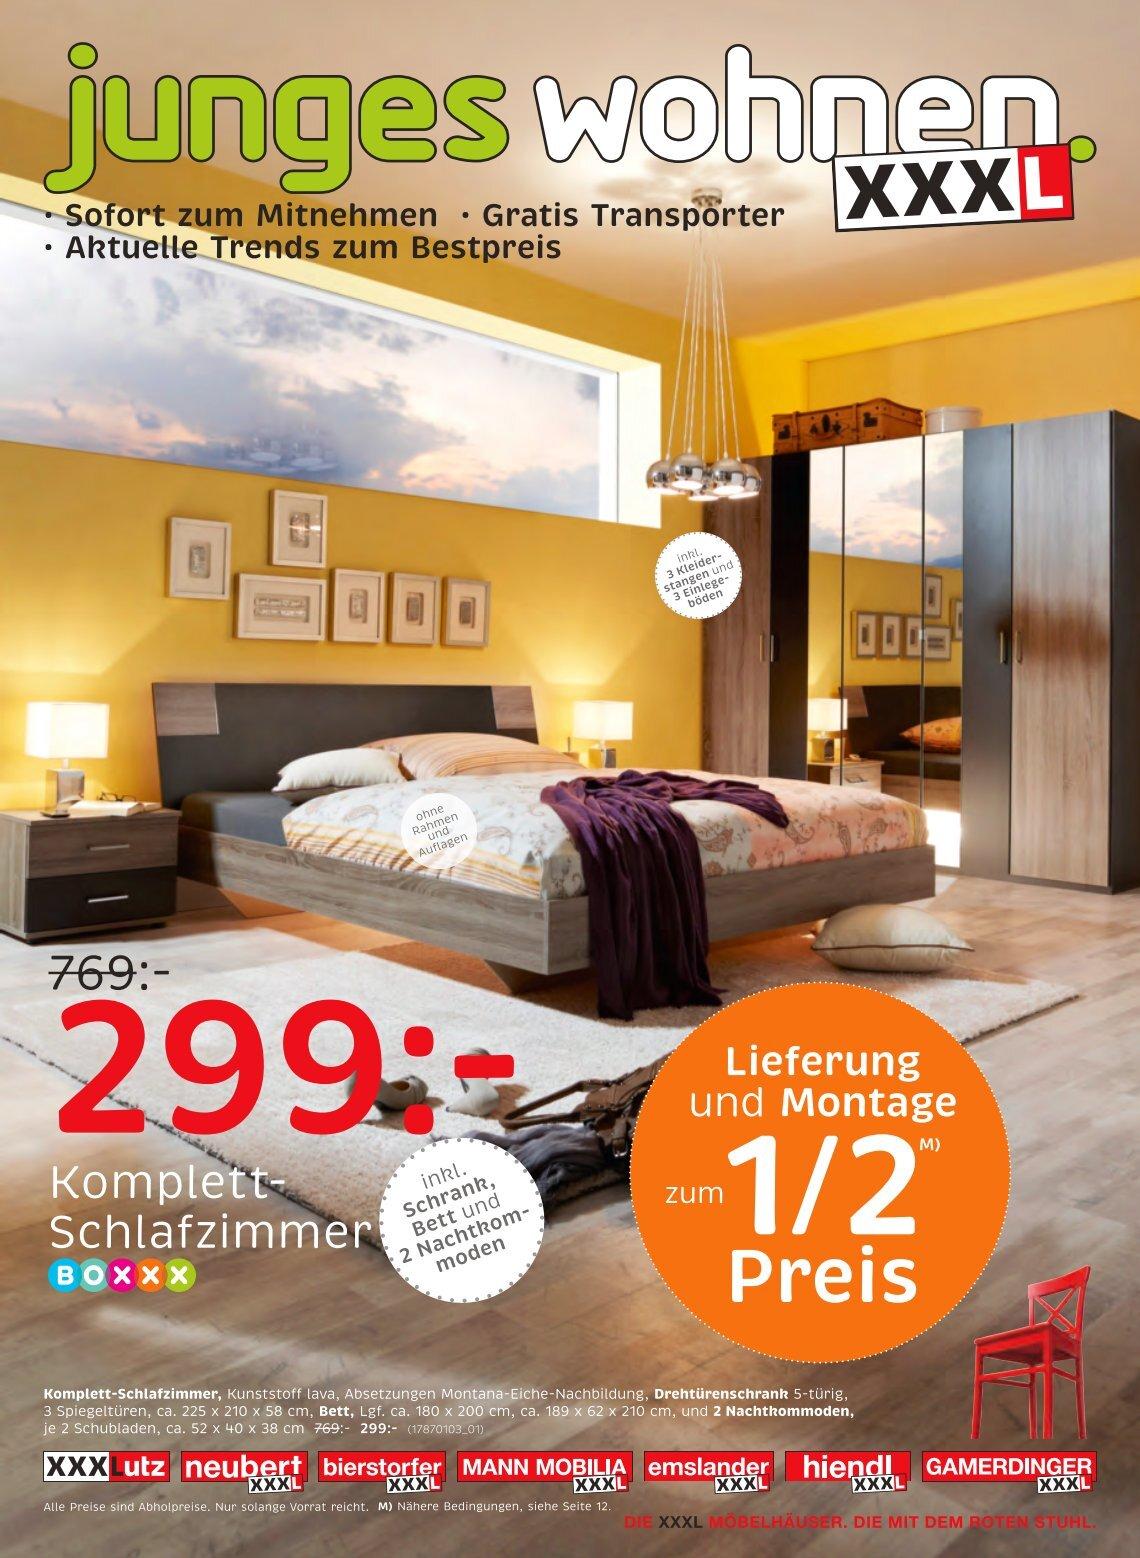 schlafzimmer komplett neubert. Black Bedroom Furniture Sets. Home Design Ideas